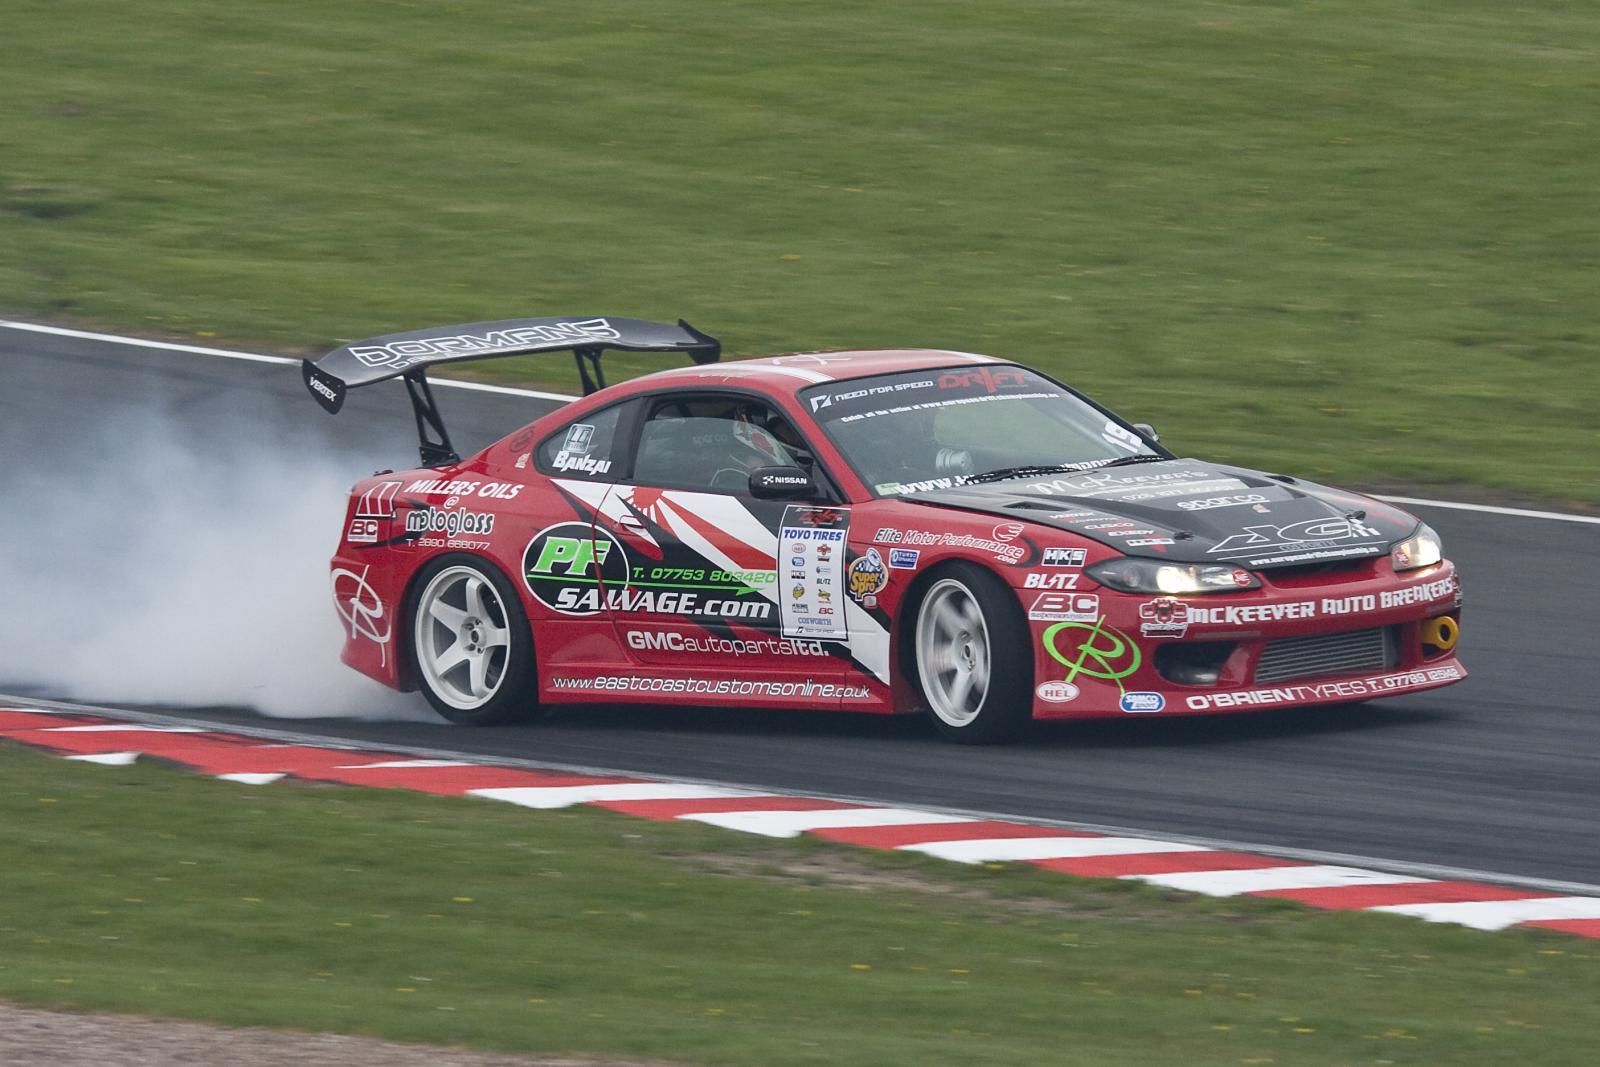 Cars Drift Wallpaper 1600x1067 Cars Drift Vehicles Nissan Silvia 1600x1067